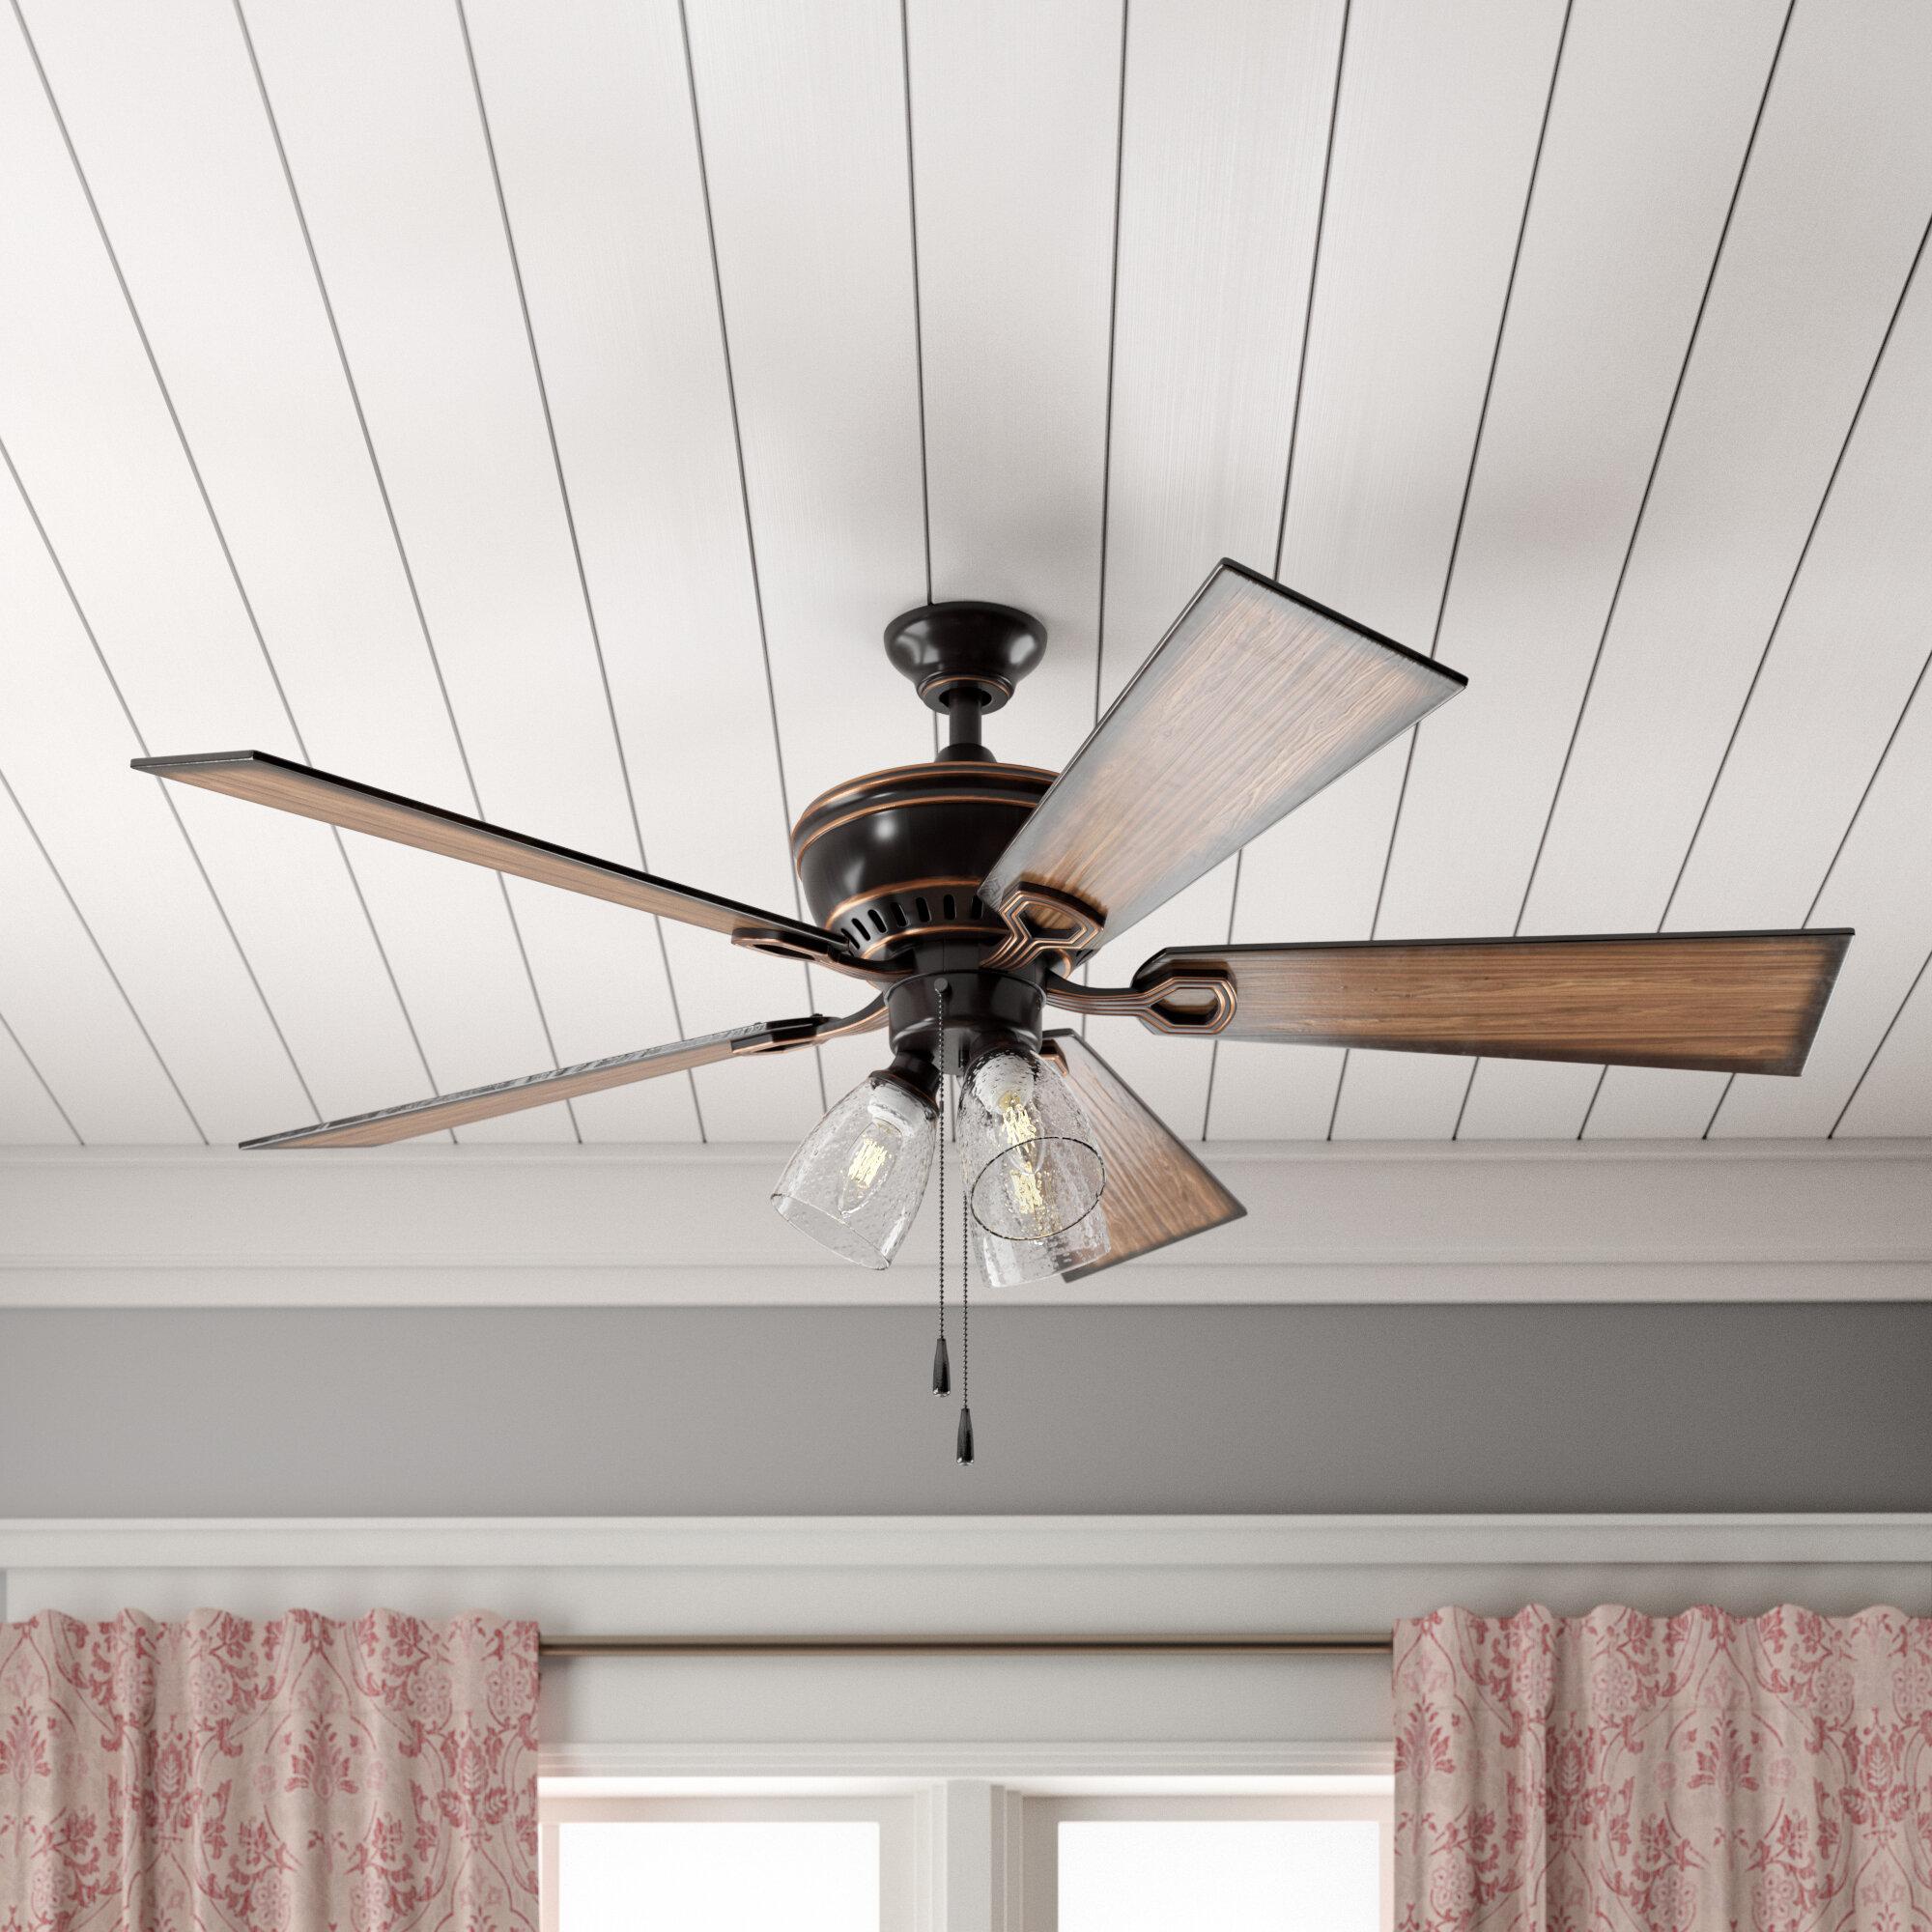 Birch lane heritage 52 ohanlon 5 blade led ceiling fan light kit included reviews birch lane